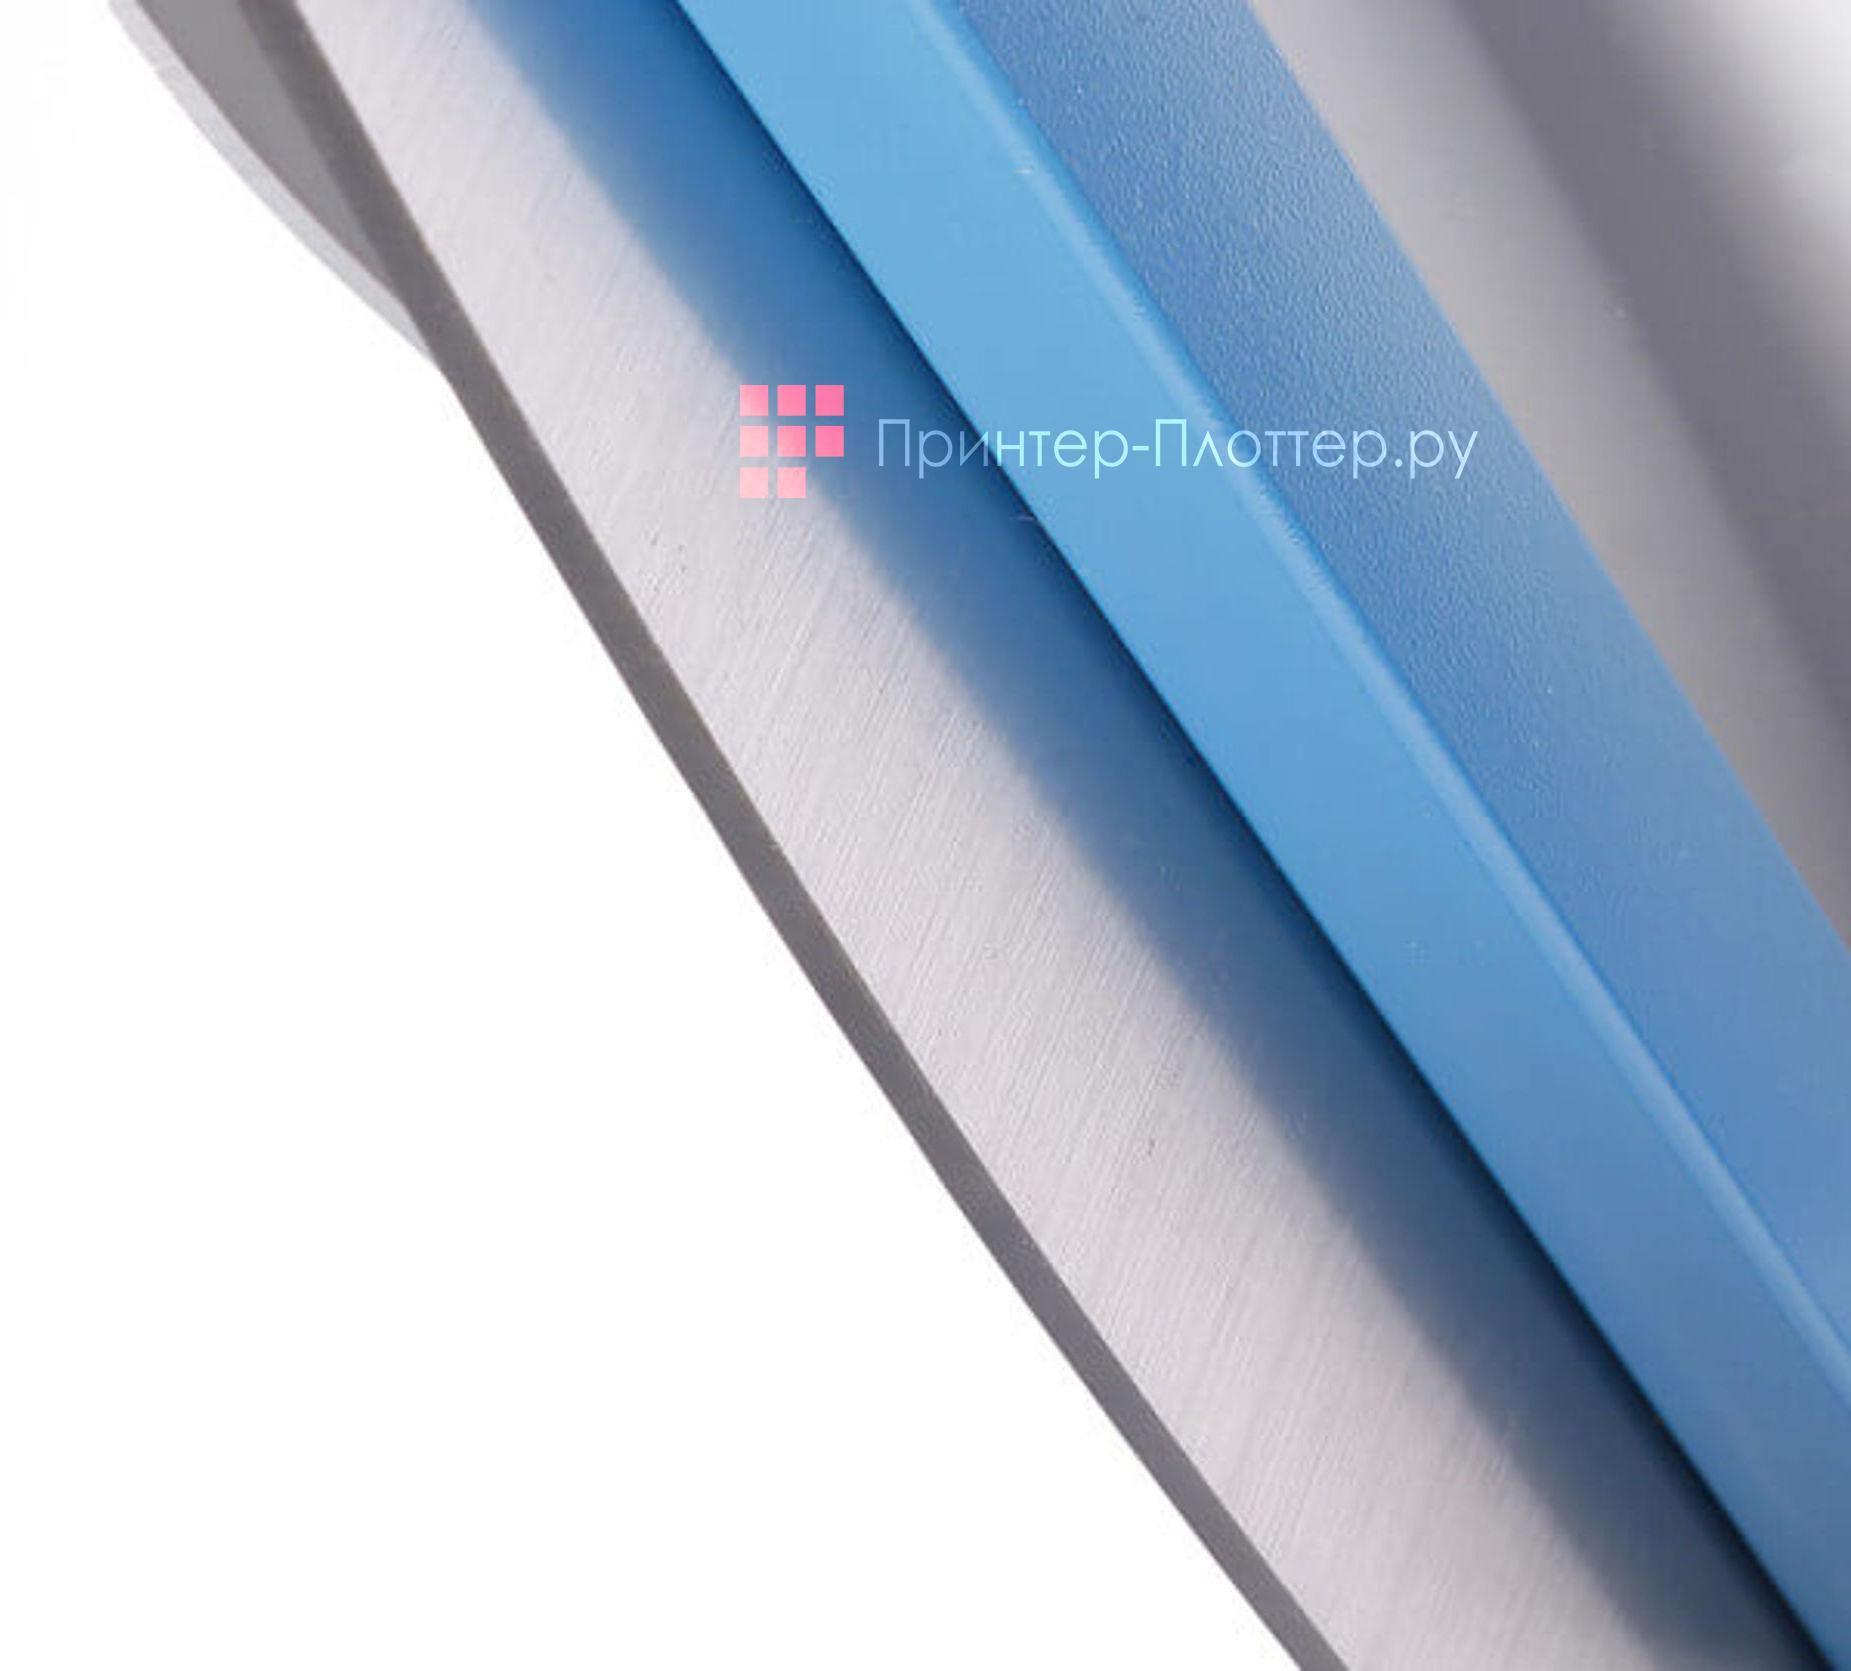 Dahle 533. Нож для материалов